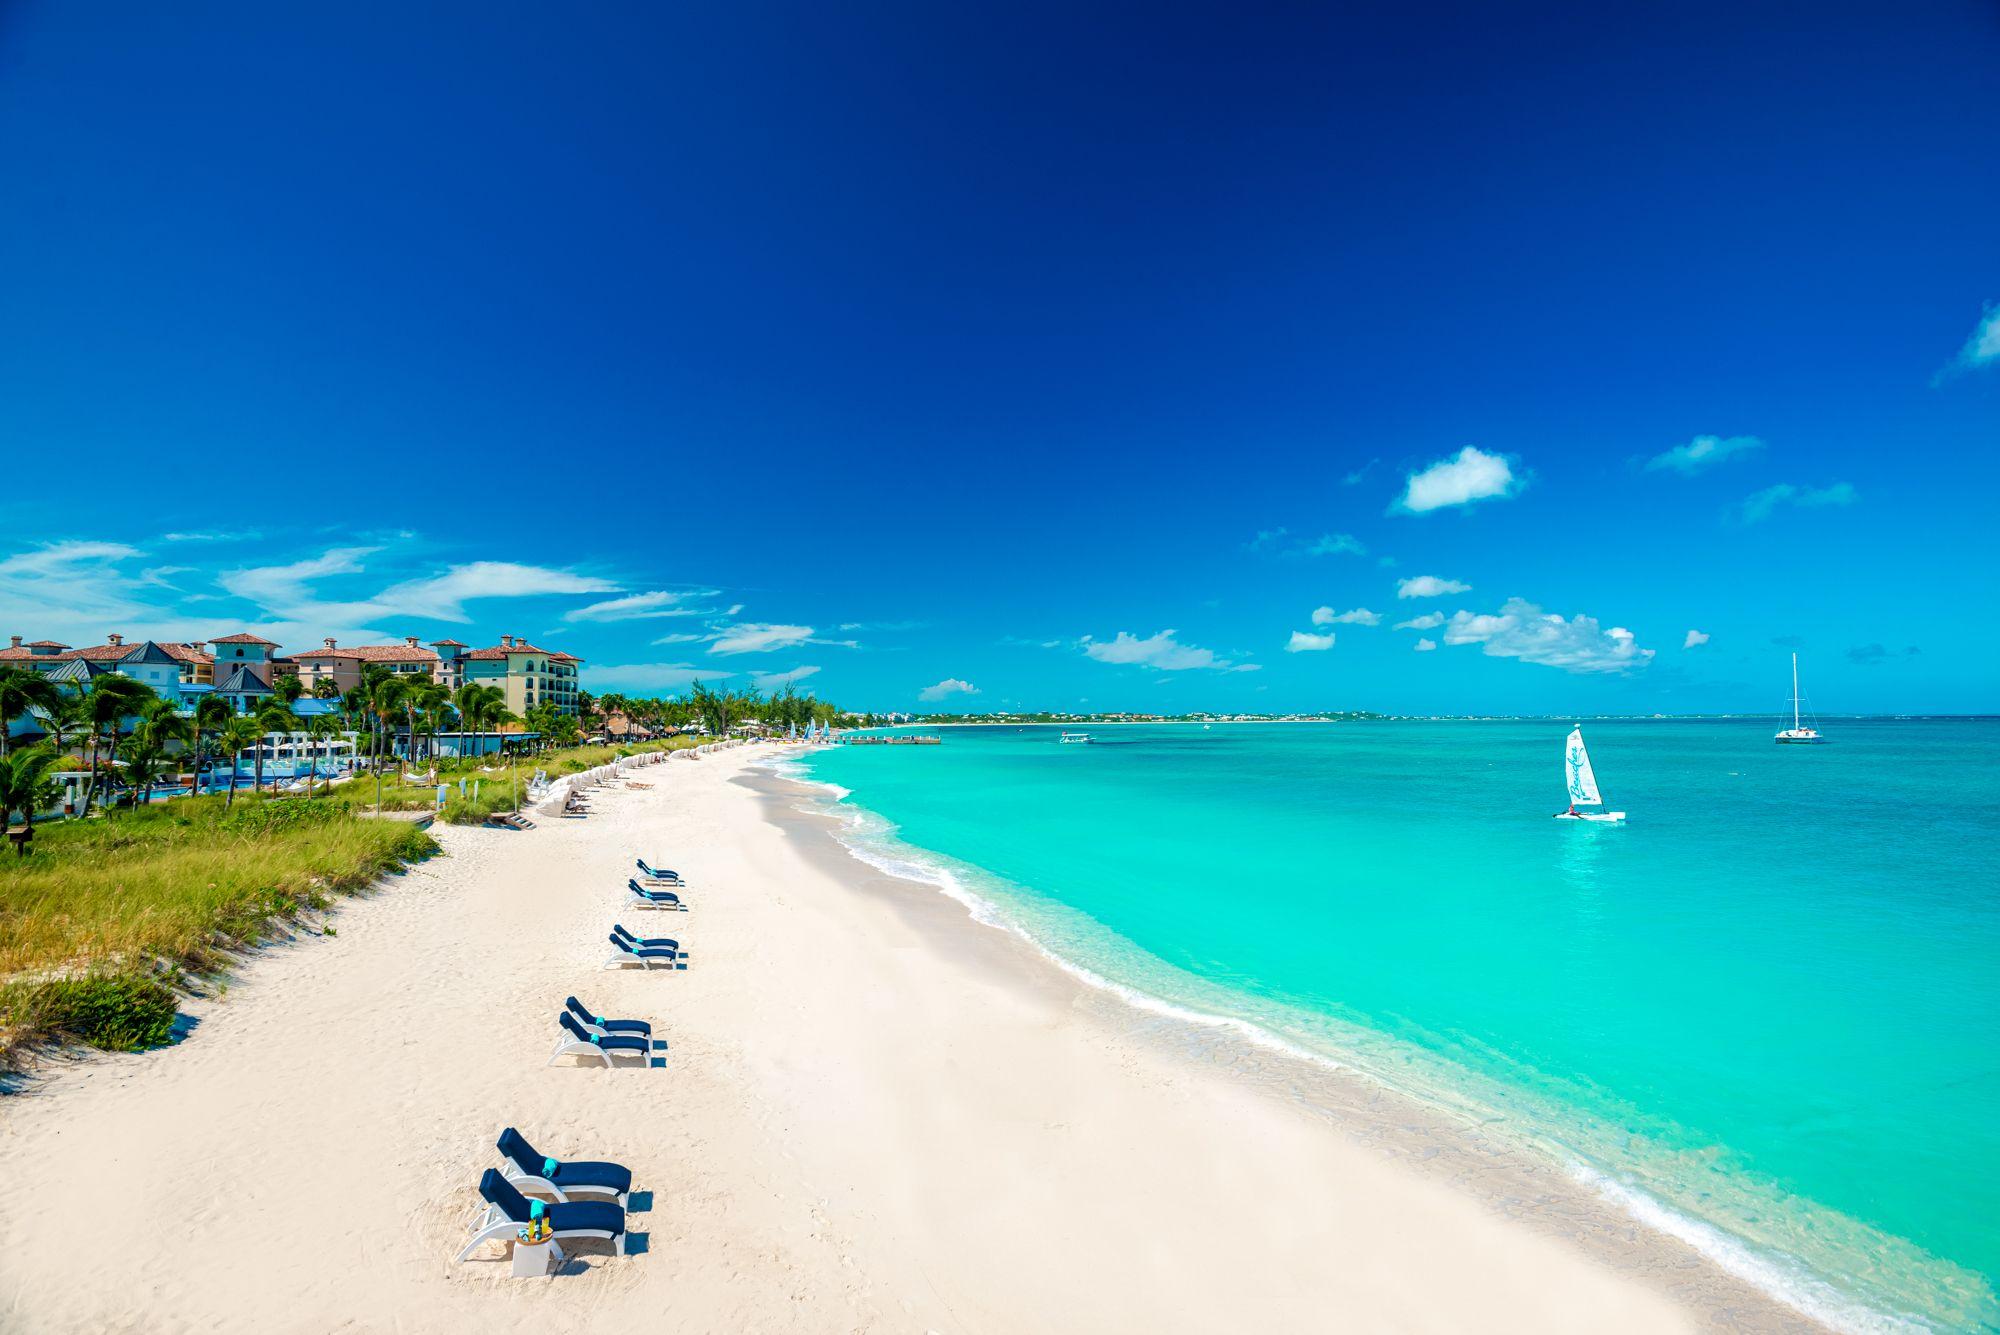 Beaches Turks Caicos Beach Overview